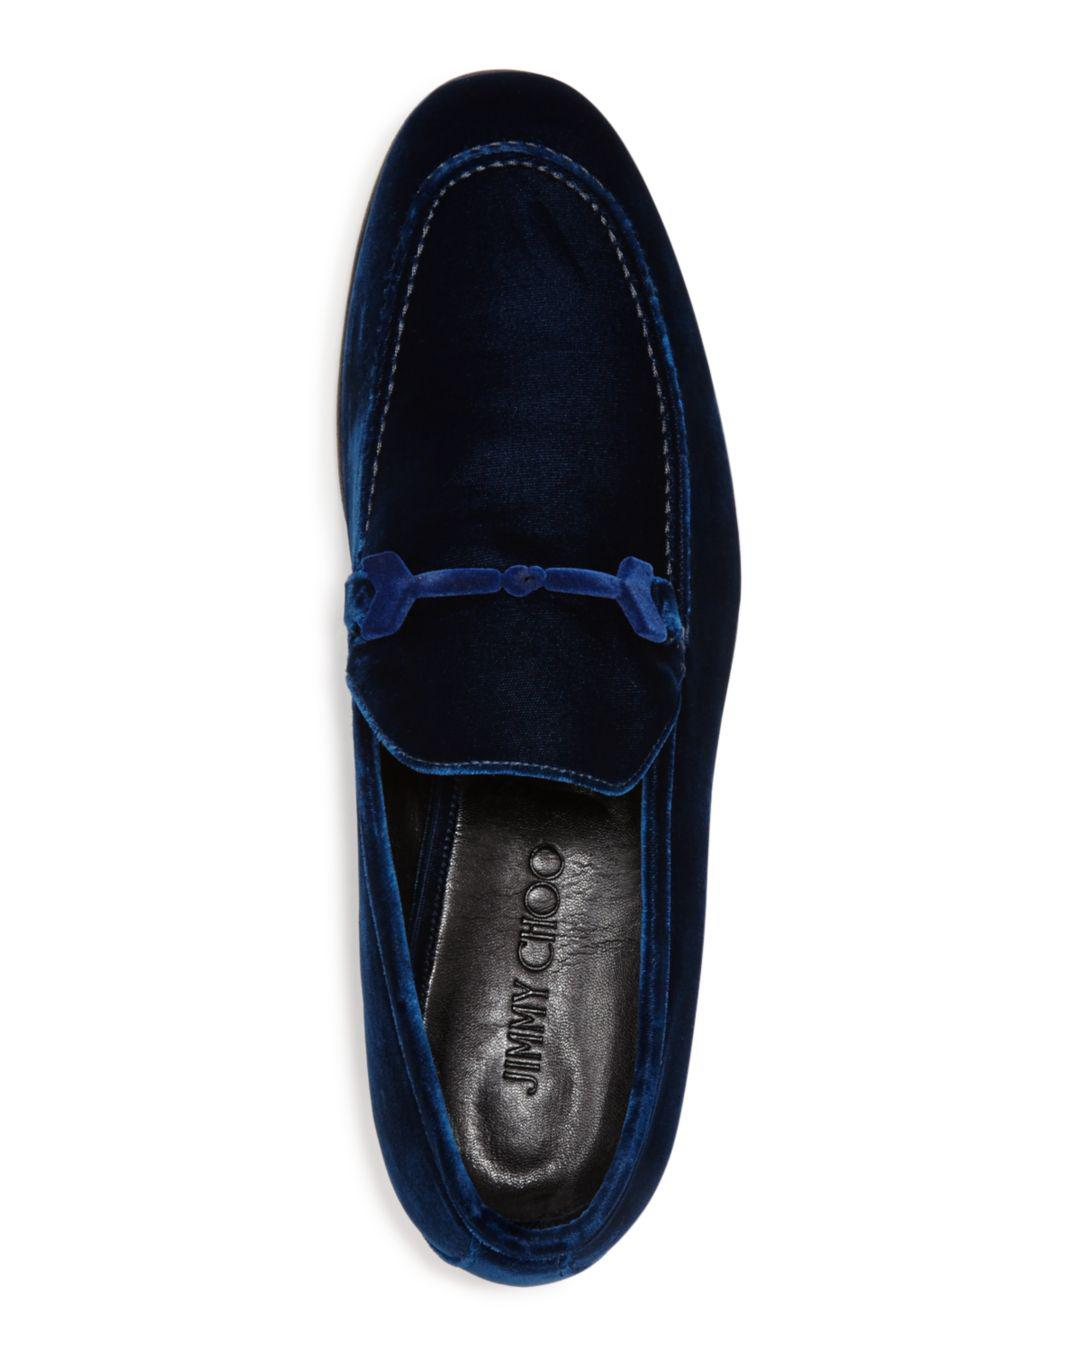 f3edf03b611 Lyst - Jimmy Choo Men s Marti Loafers in Blue for Men